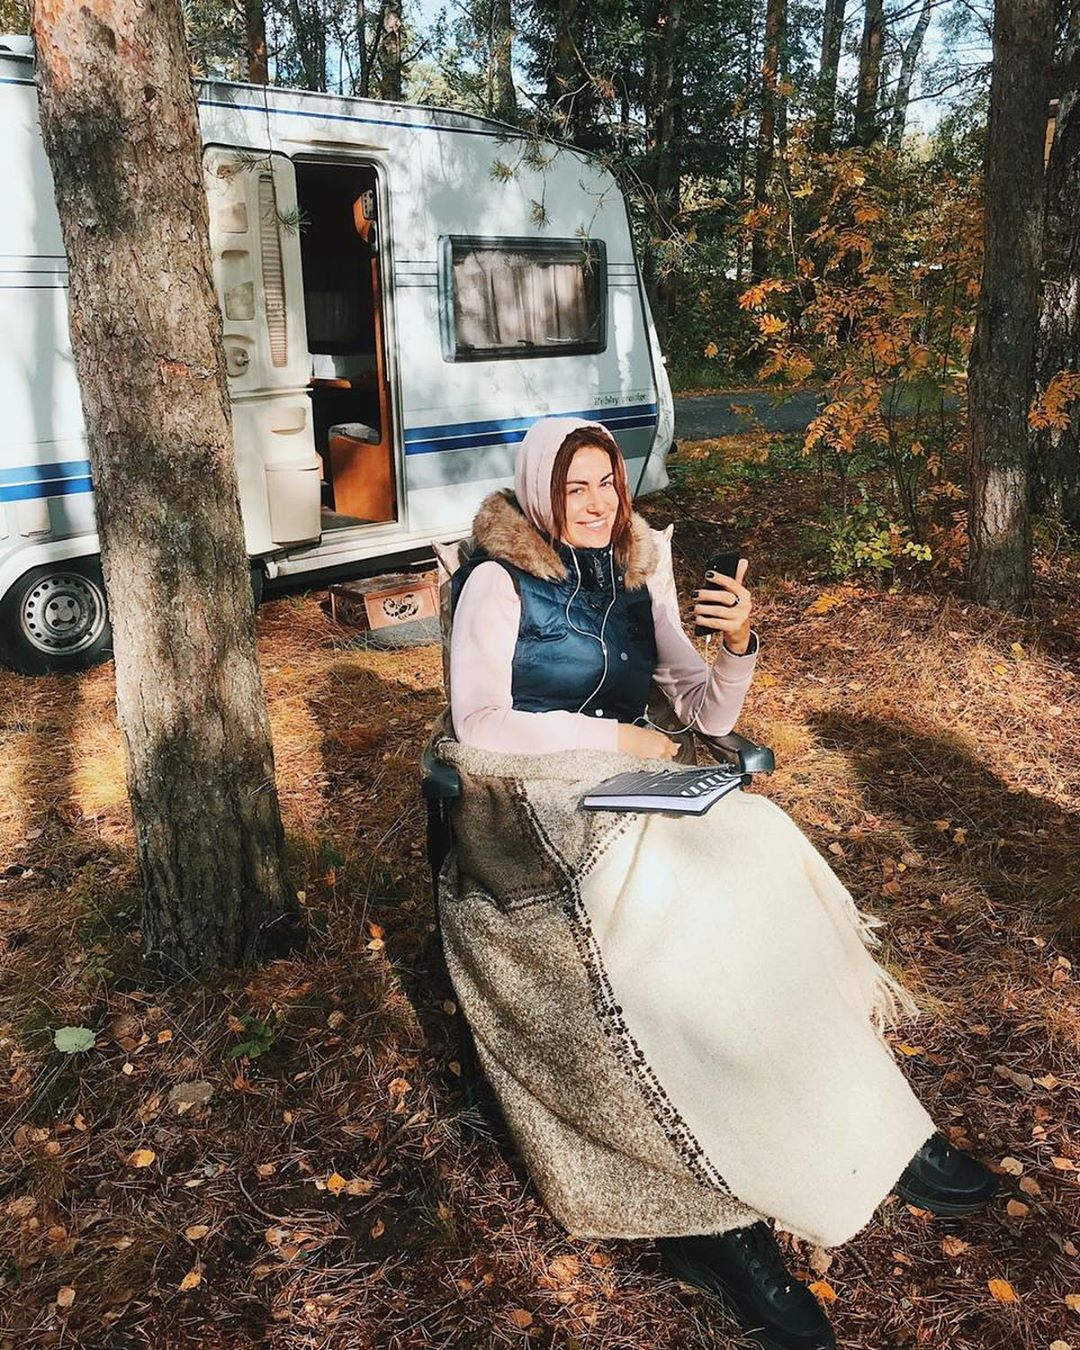 Анна Ковальчук на съемках Тайны следствия